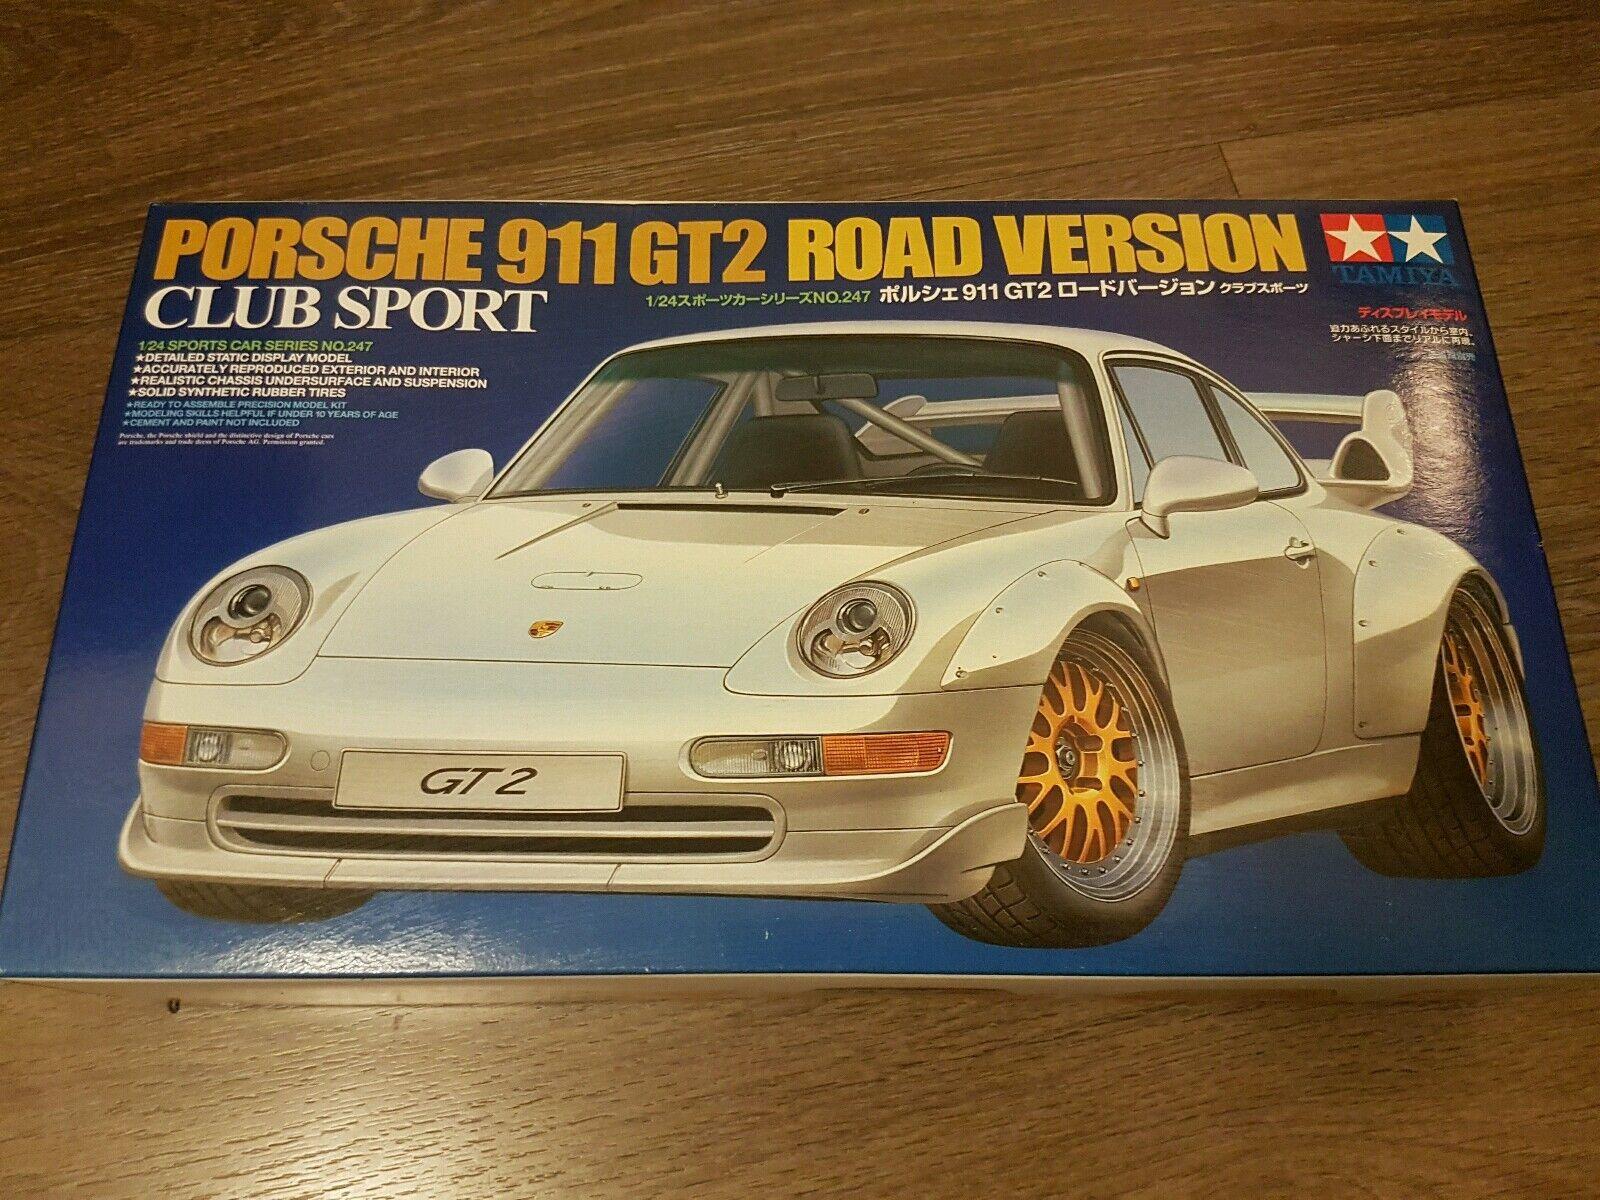 Tamiya 1 24 Tamiya 911 GT2 Road Version Club Sport Great Condition Rare